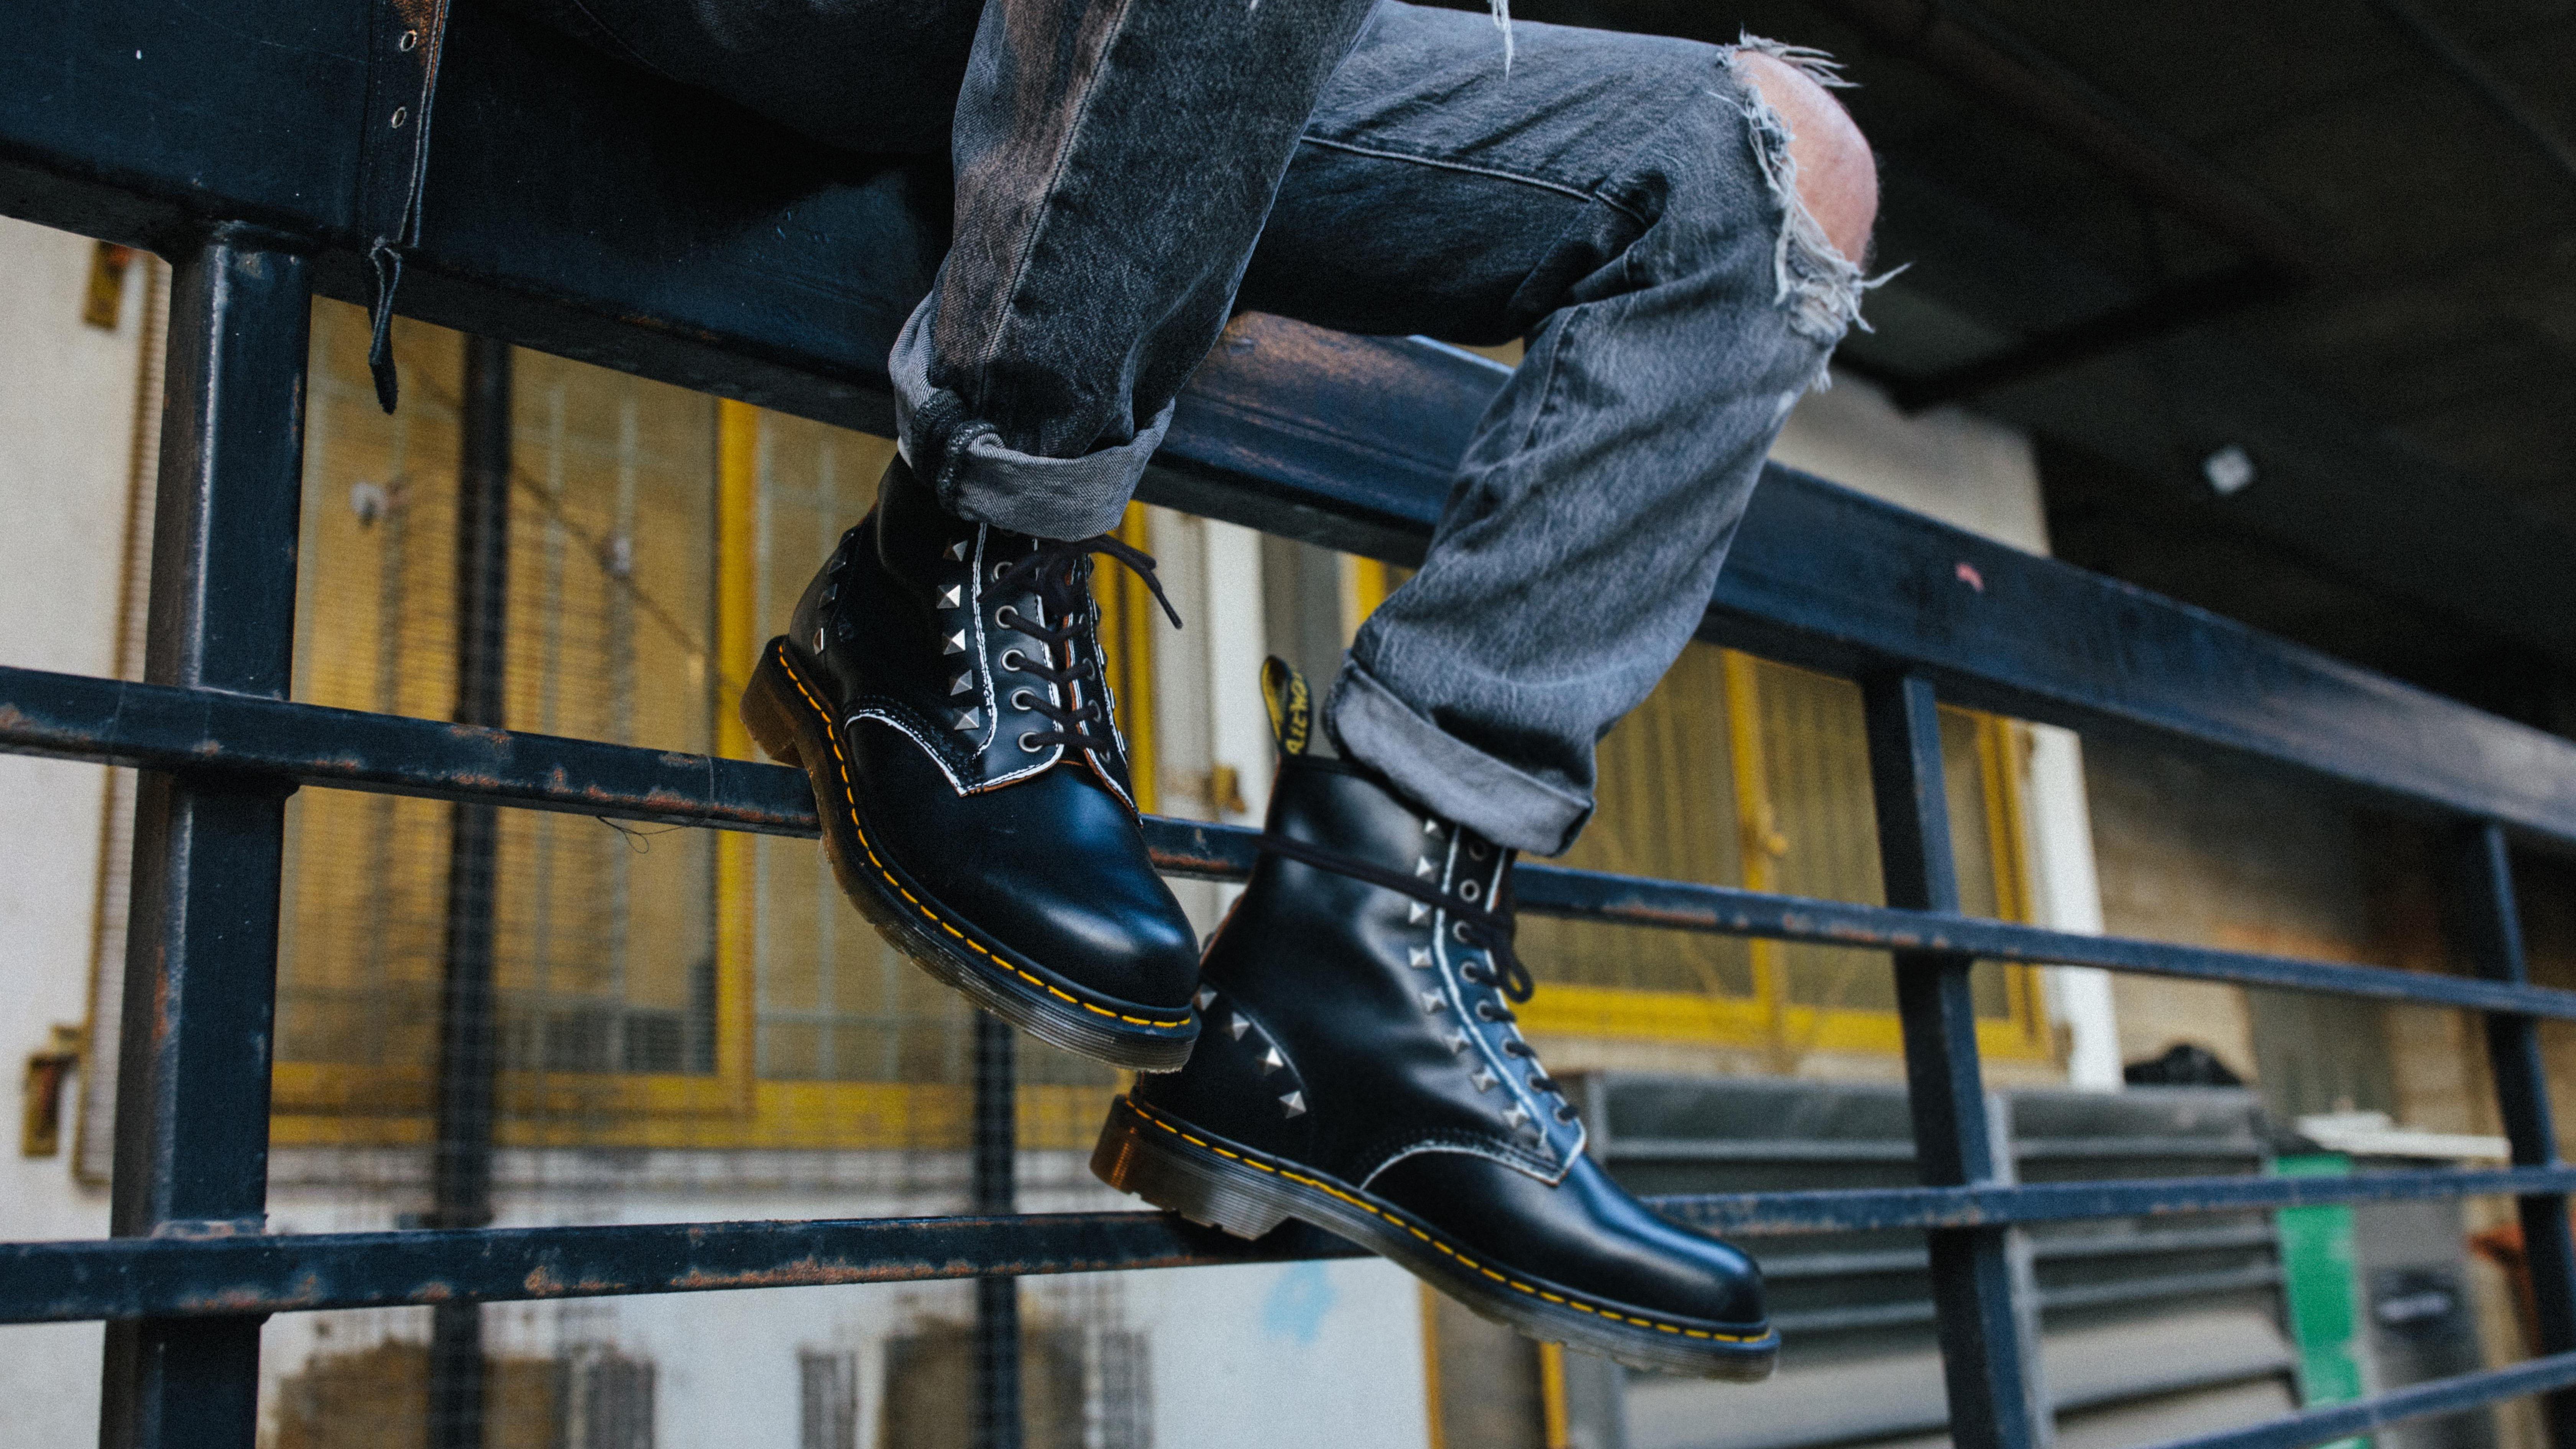 Doc Martens's vegan boot business is thriving — Quartz